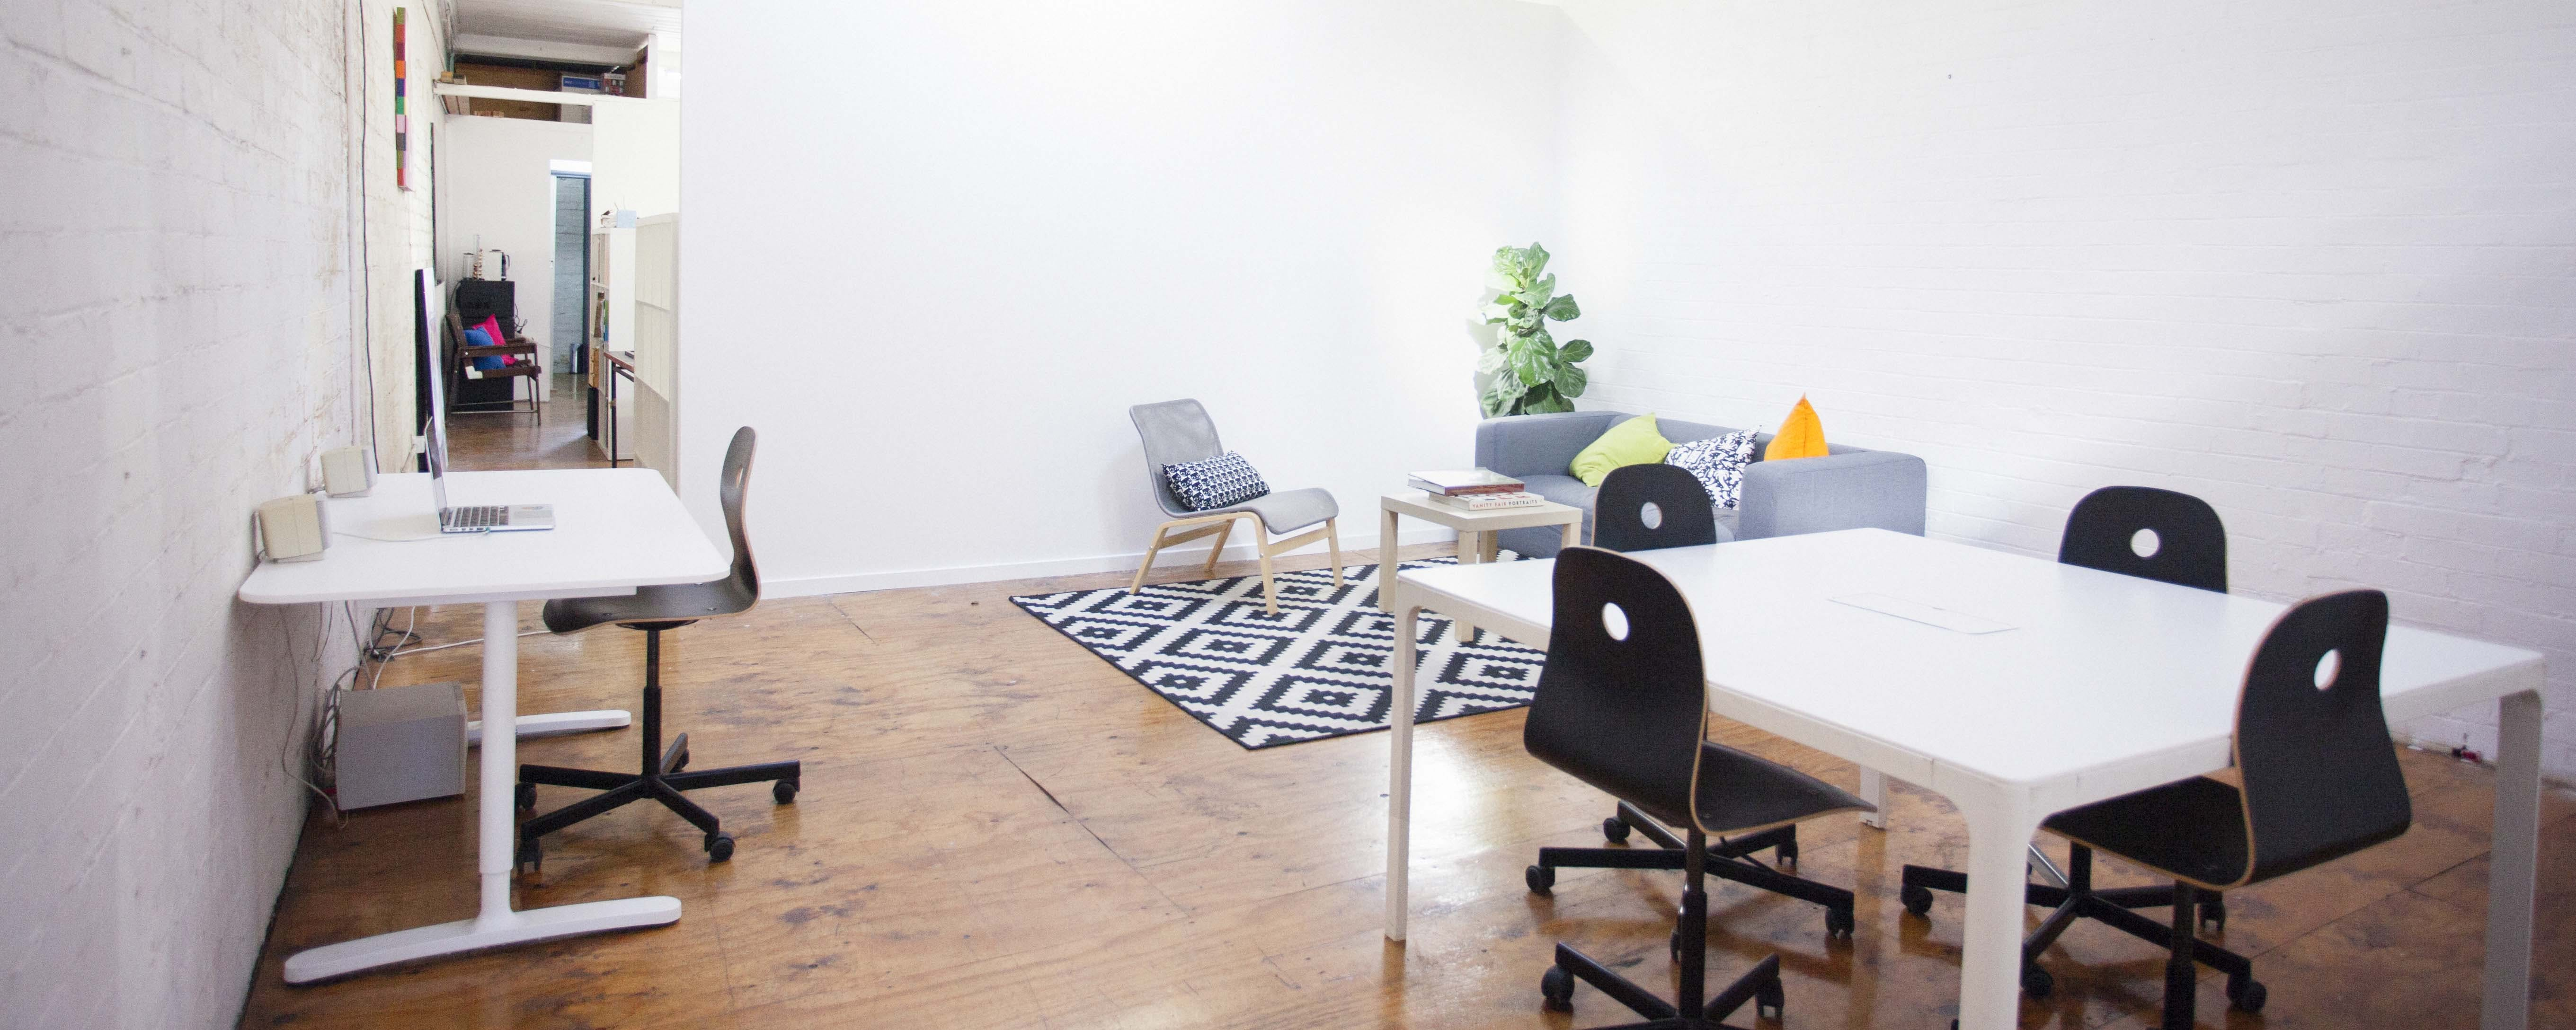 Dedicated desk at Desk and Studio, image 3